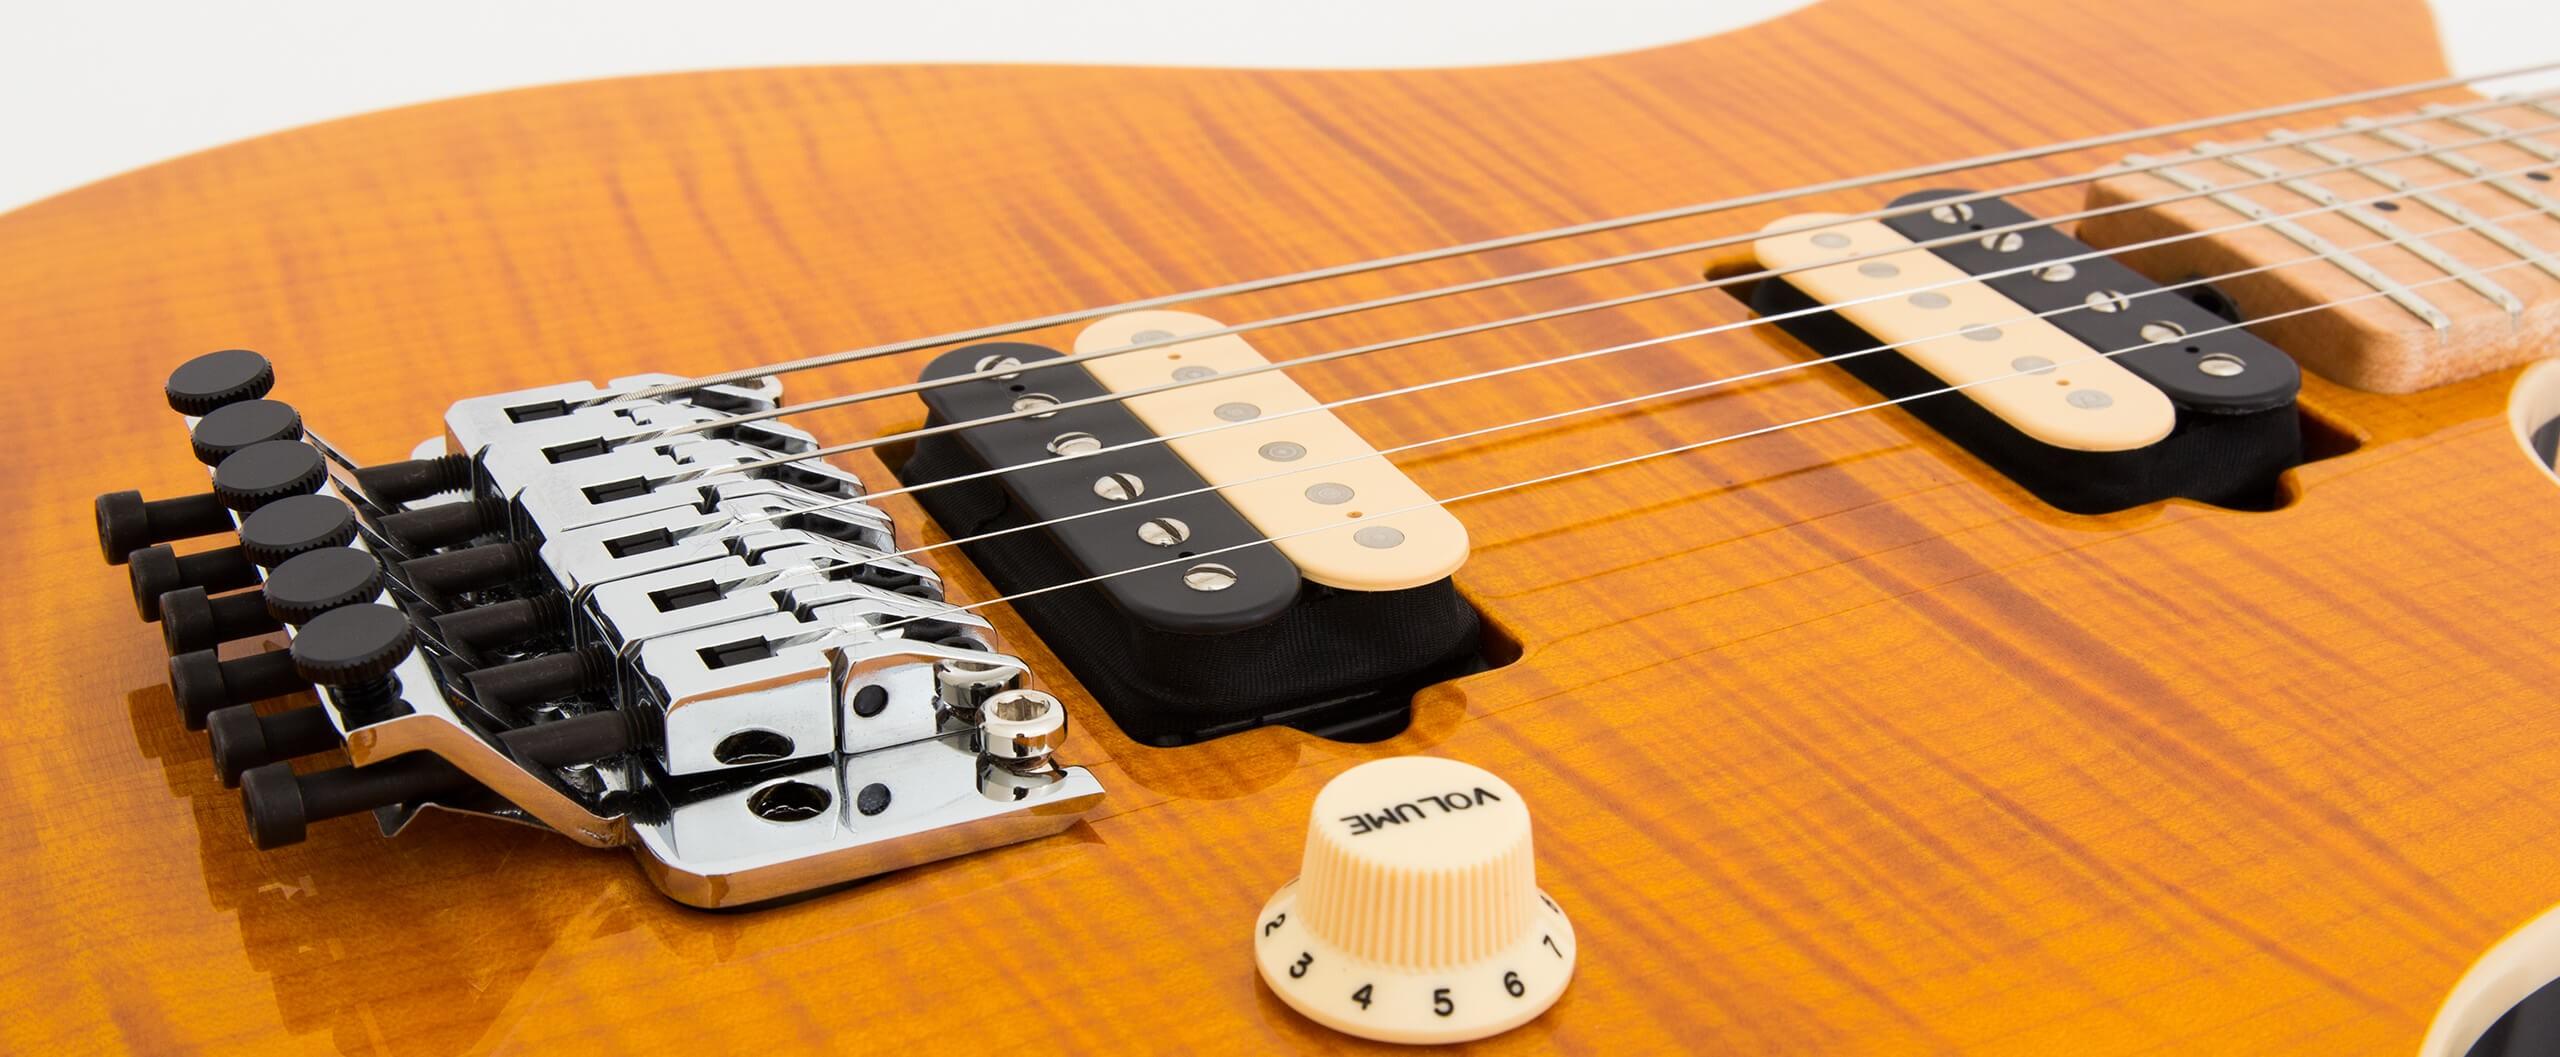 Floyd Rose Parts Diagram Axis Guitars Of Floyd Rose Parts Diagram